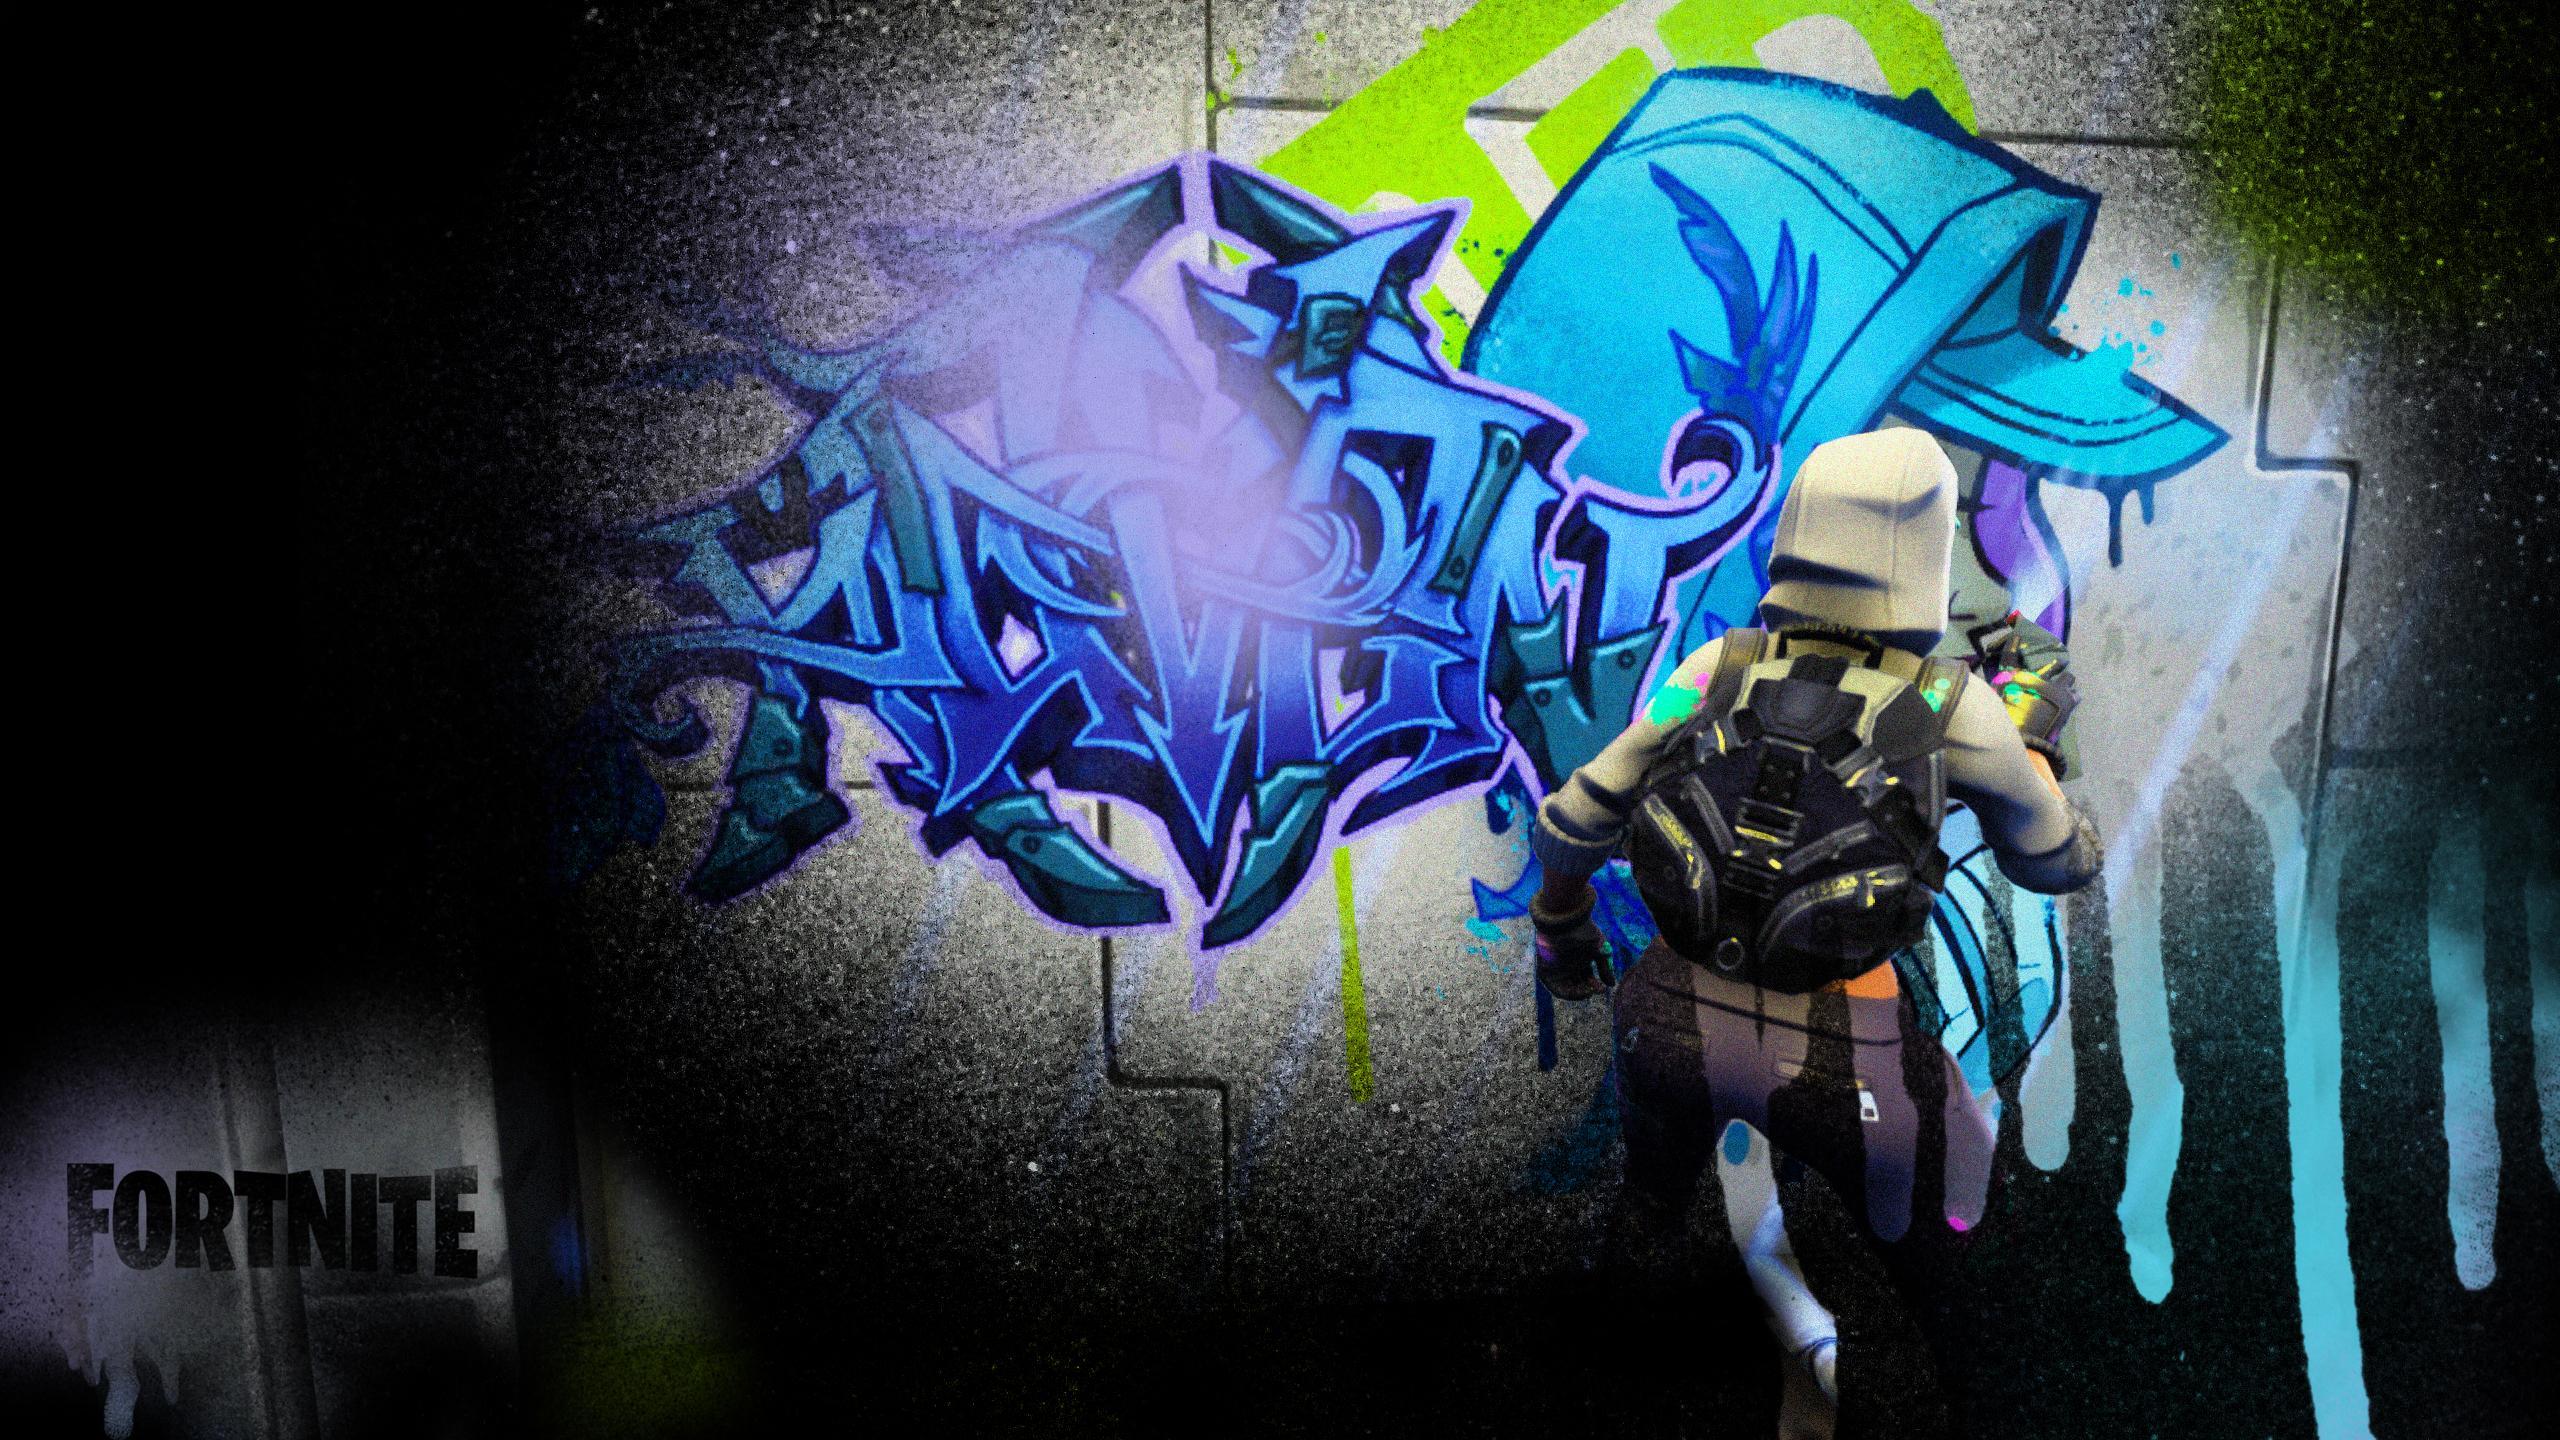 Sick Graffiti Wallpapers on WallpaperDog